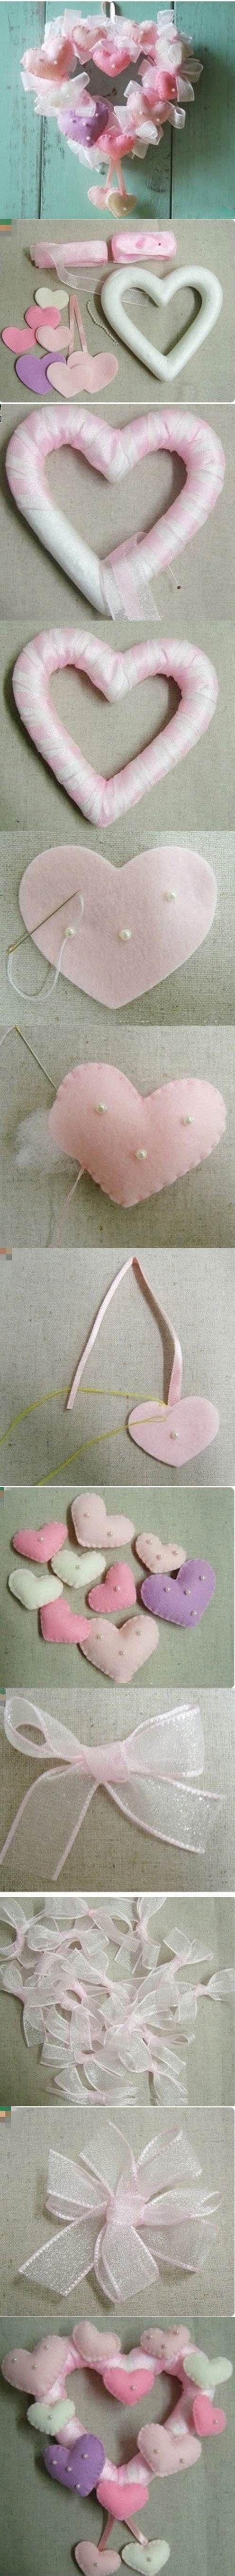 DIY Valentine's Day Heart Shaped Wreath   iCreativeIdeas.com Like Us on Facebook ==> https://www.facebook.com/icreativeideas